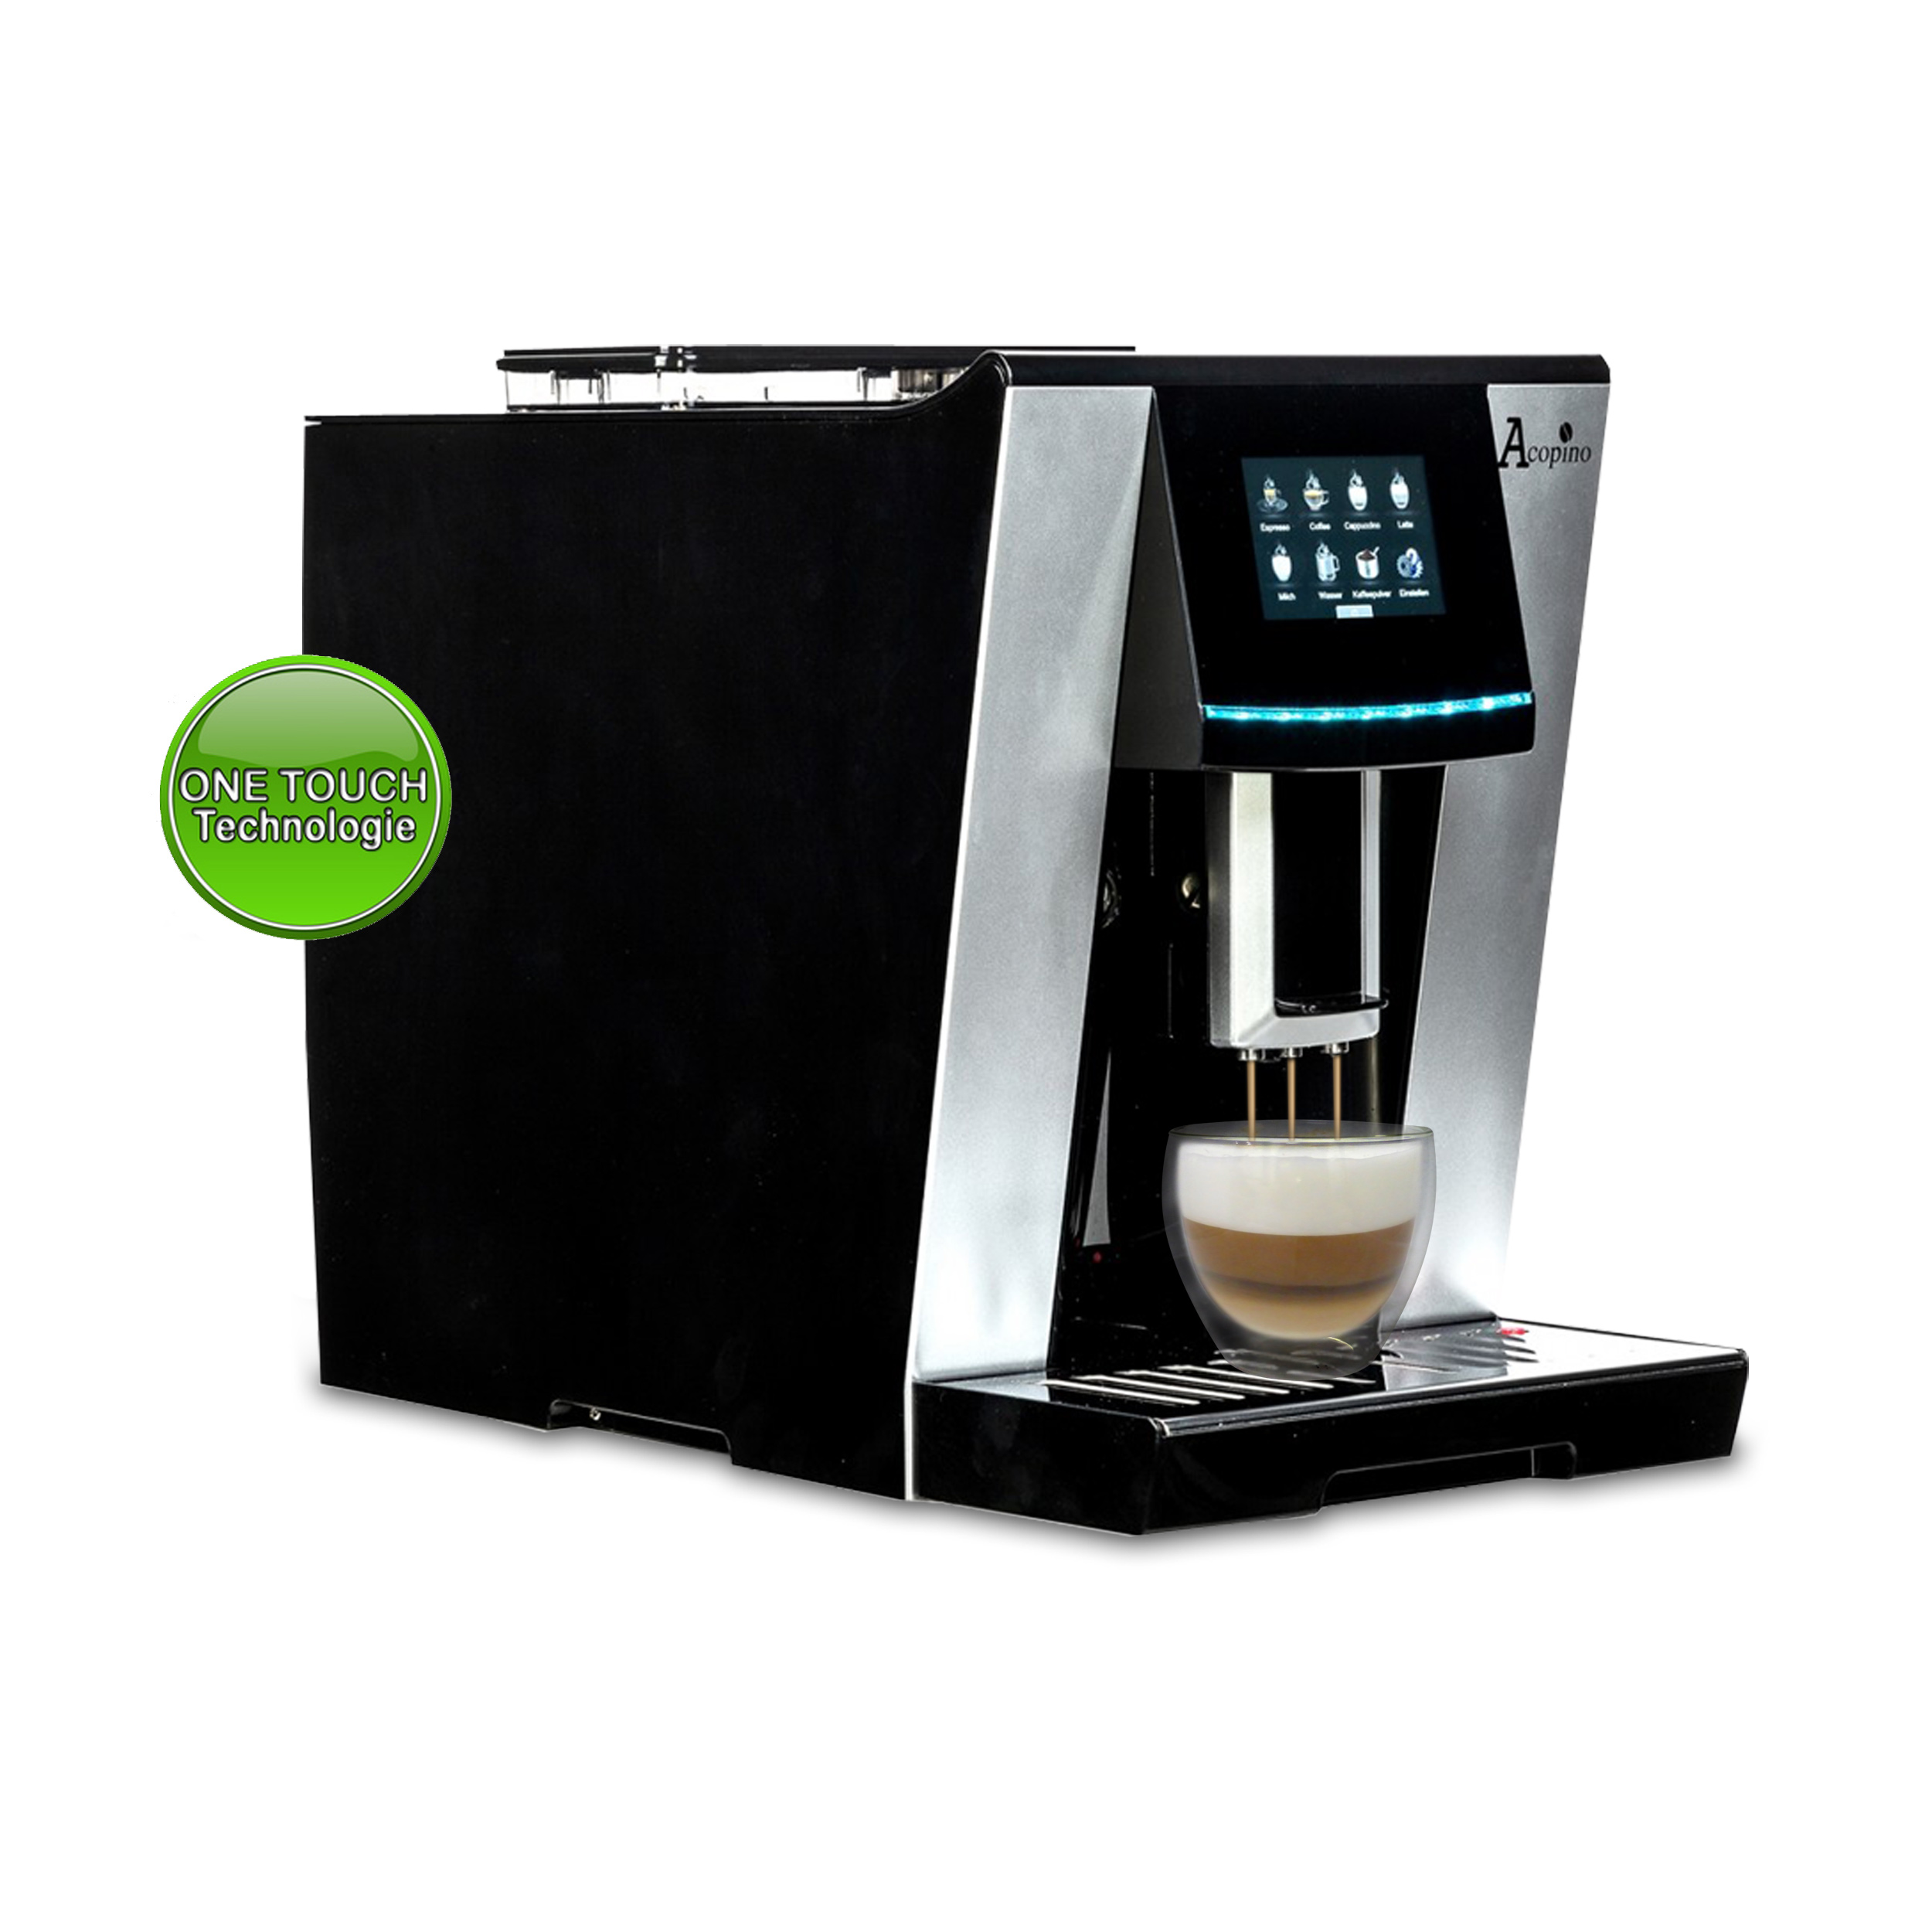 Acopino Vittoria Kaffeevollautomat mit ONE TOUCH